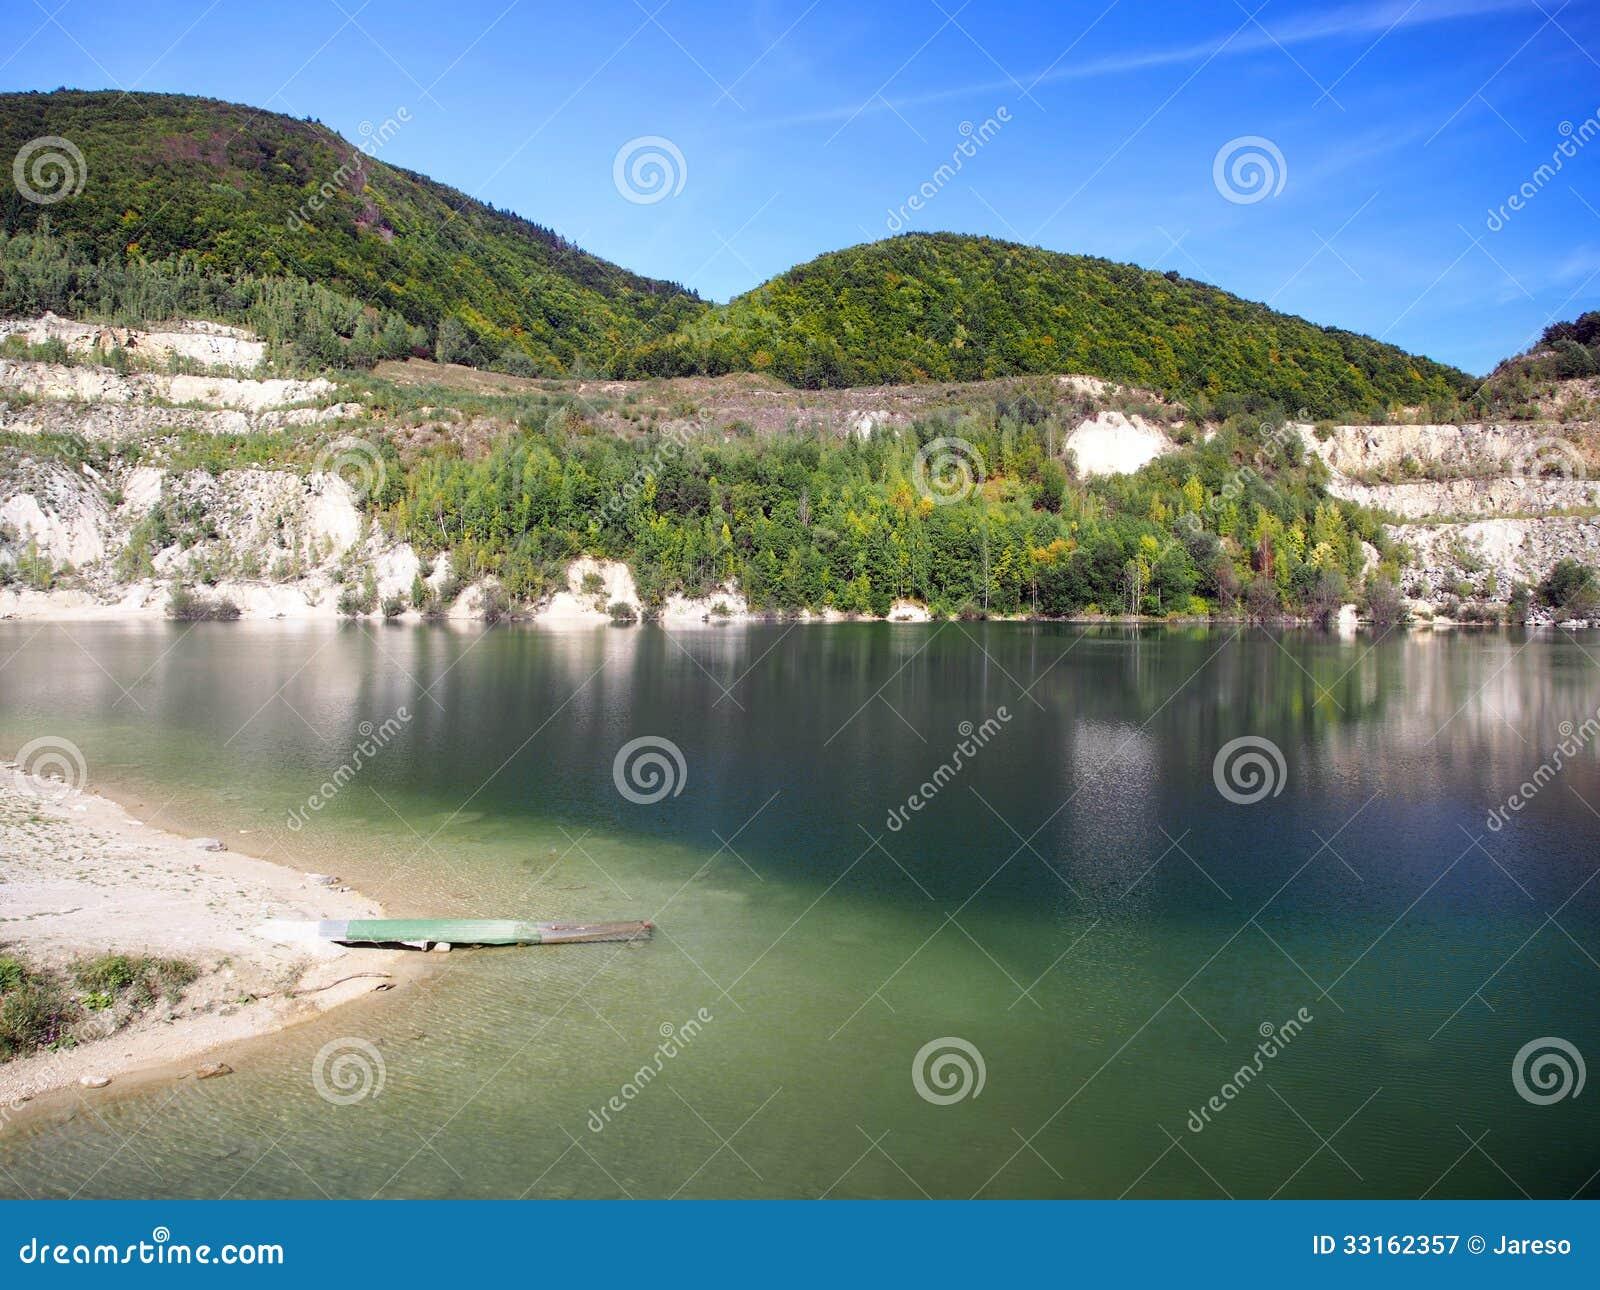 Summer view of Sutovo lake, Slovakia